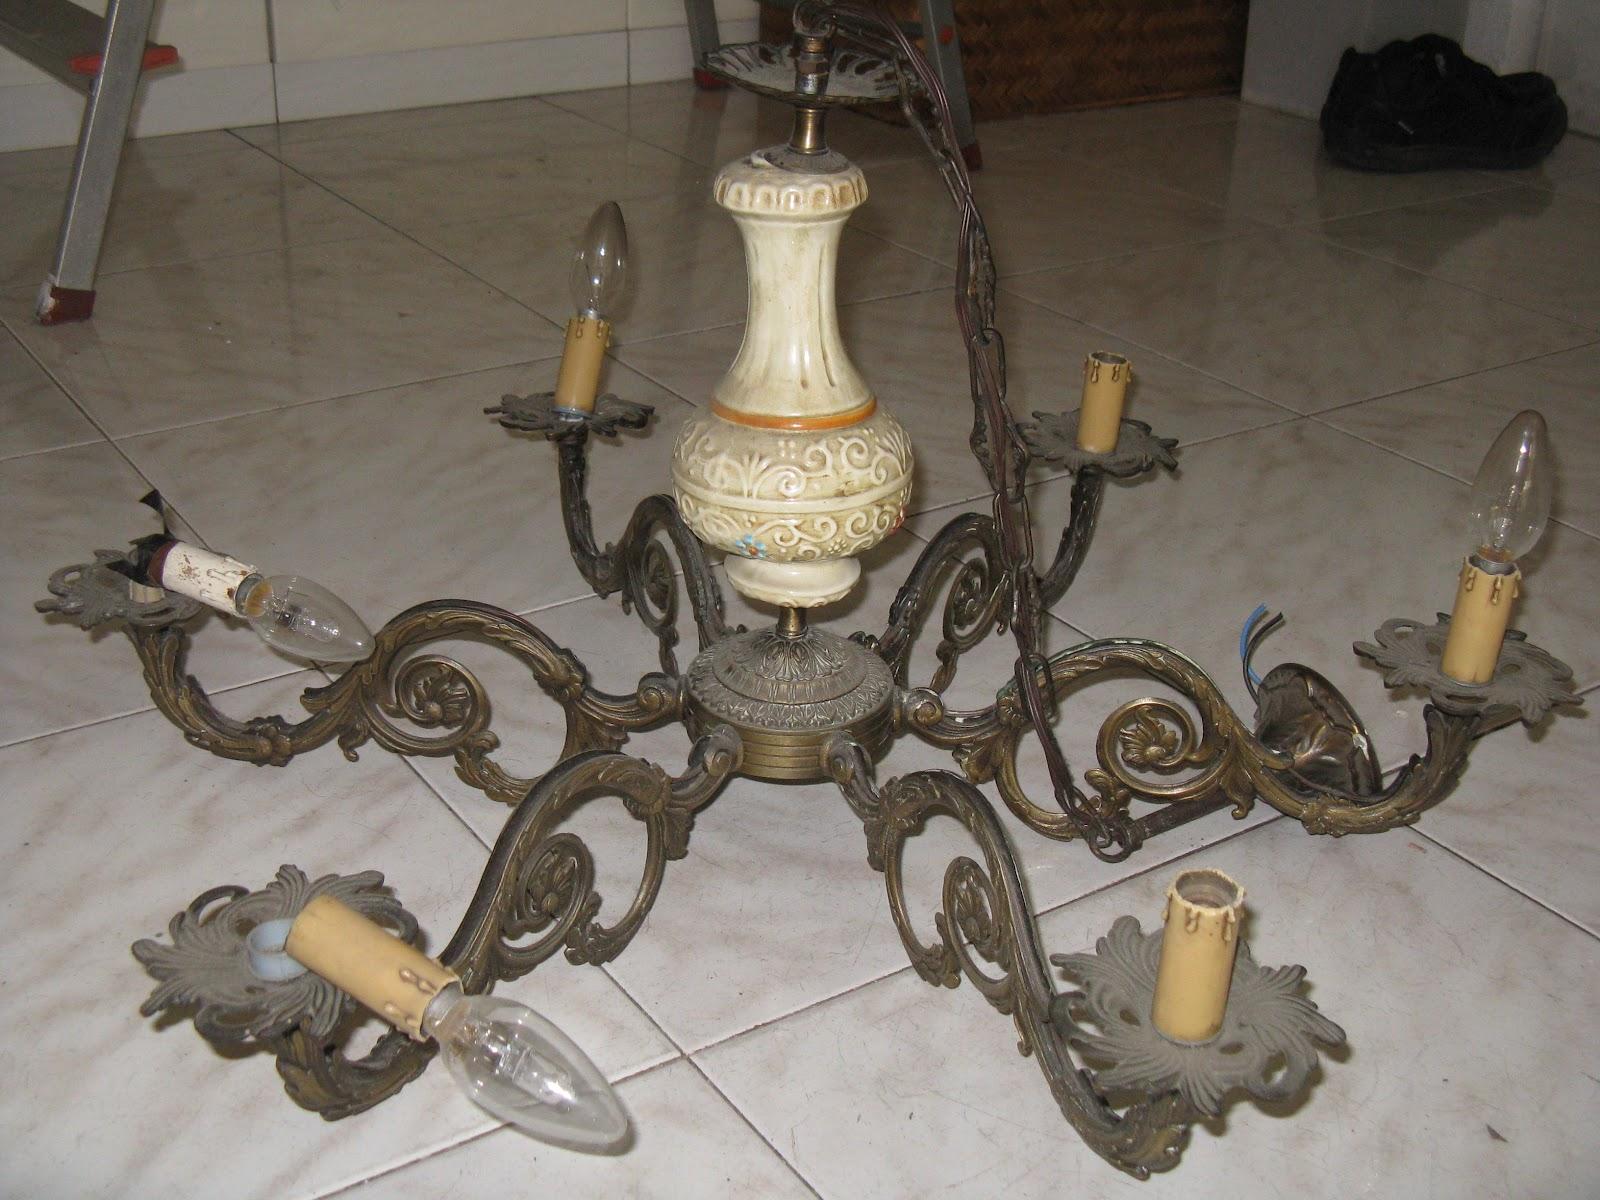 riciclo creativo da lampadario a portatorte